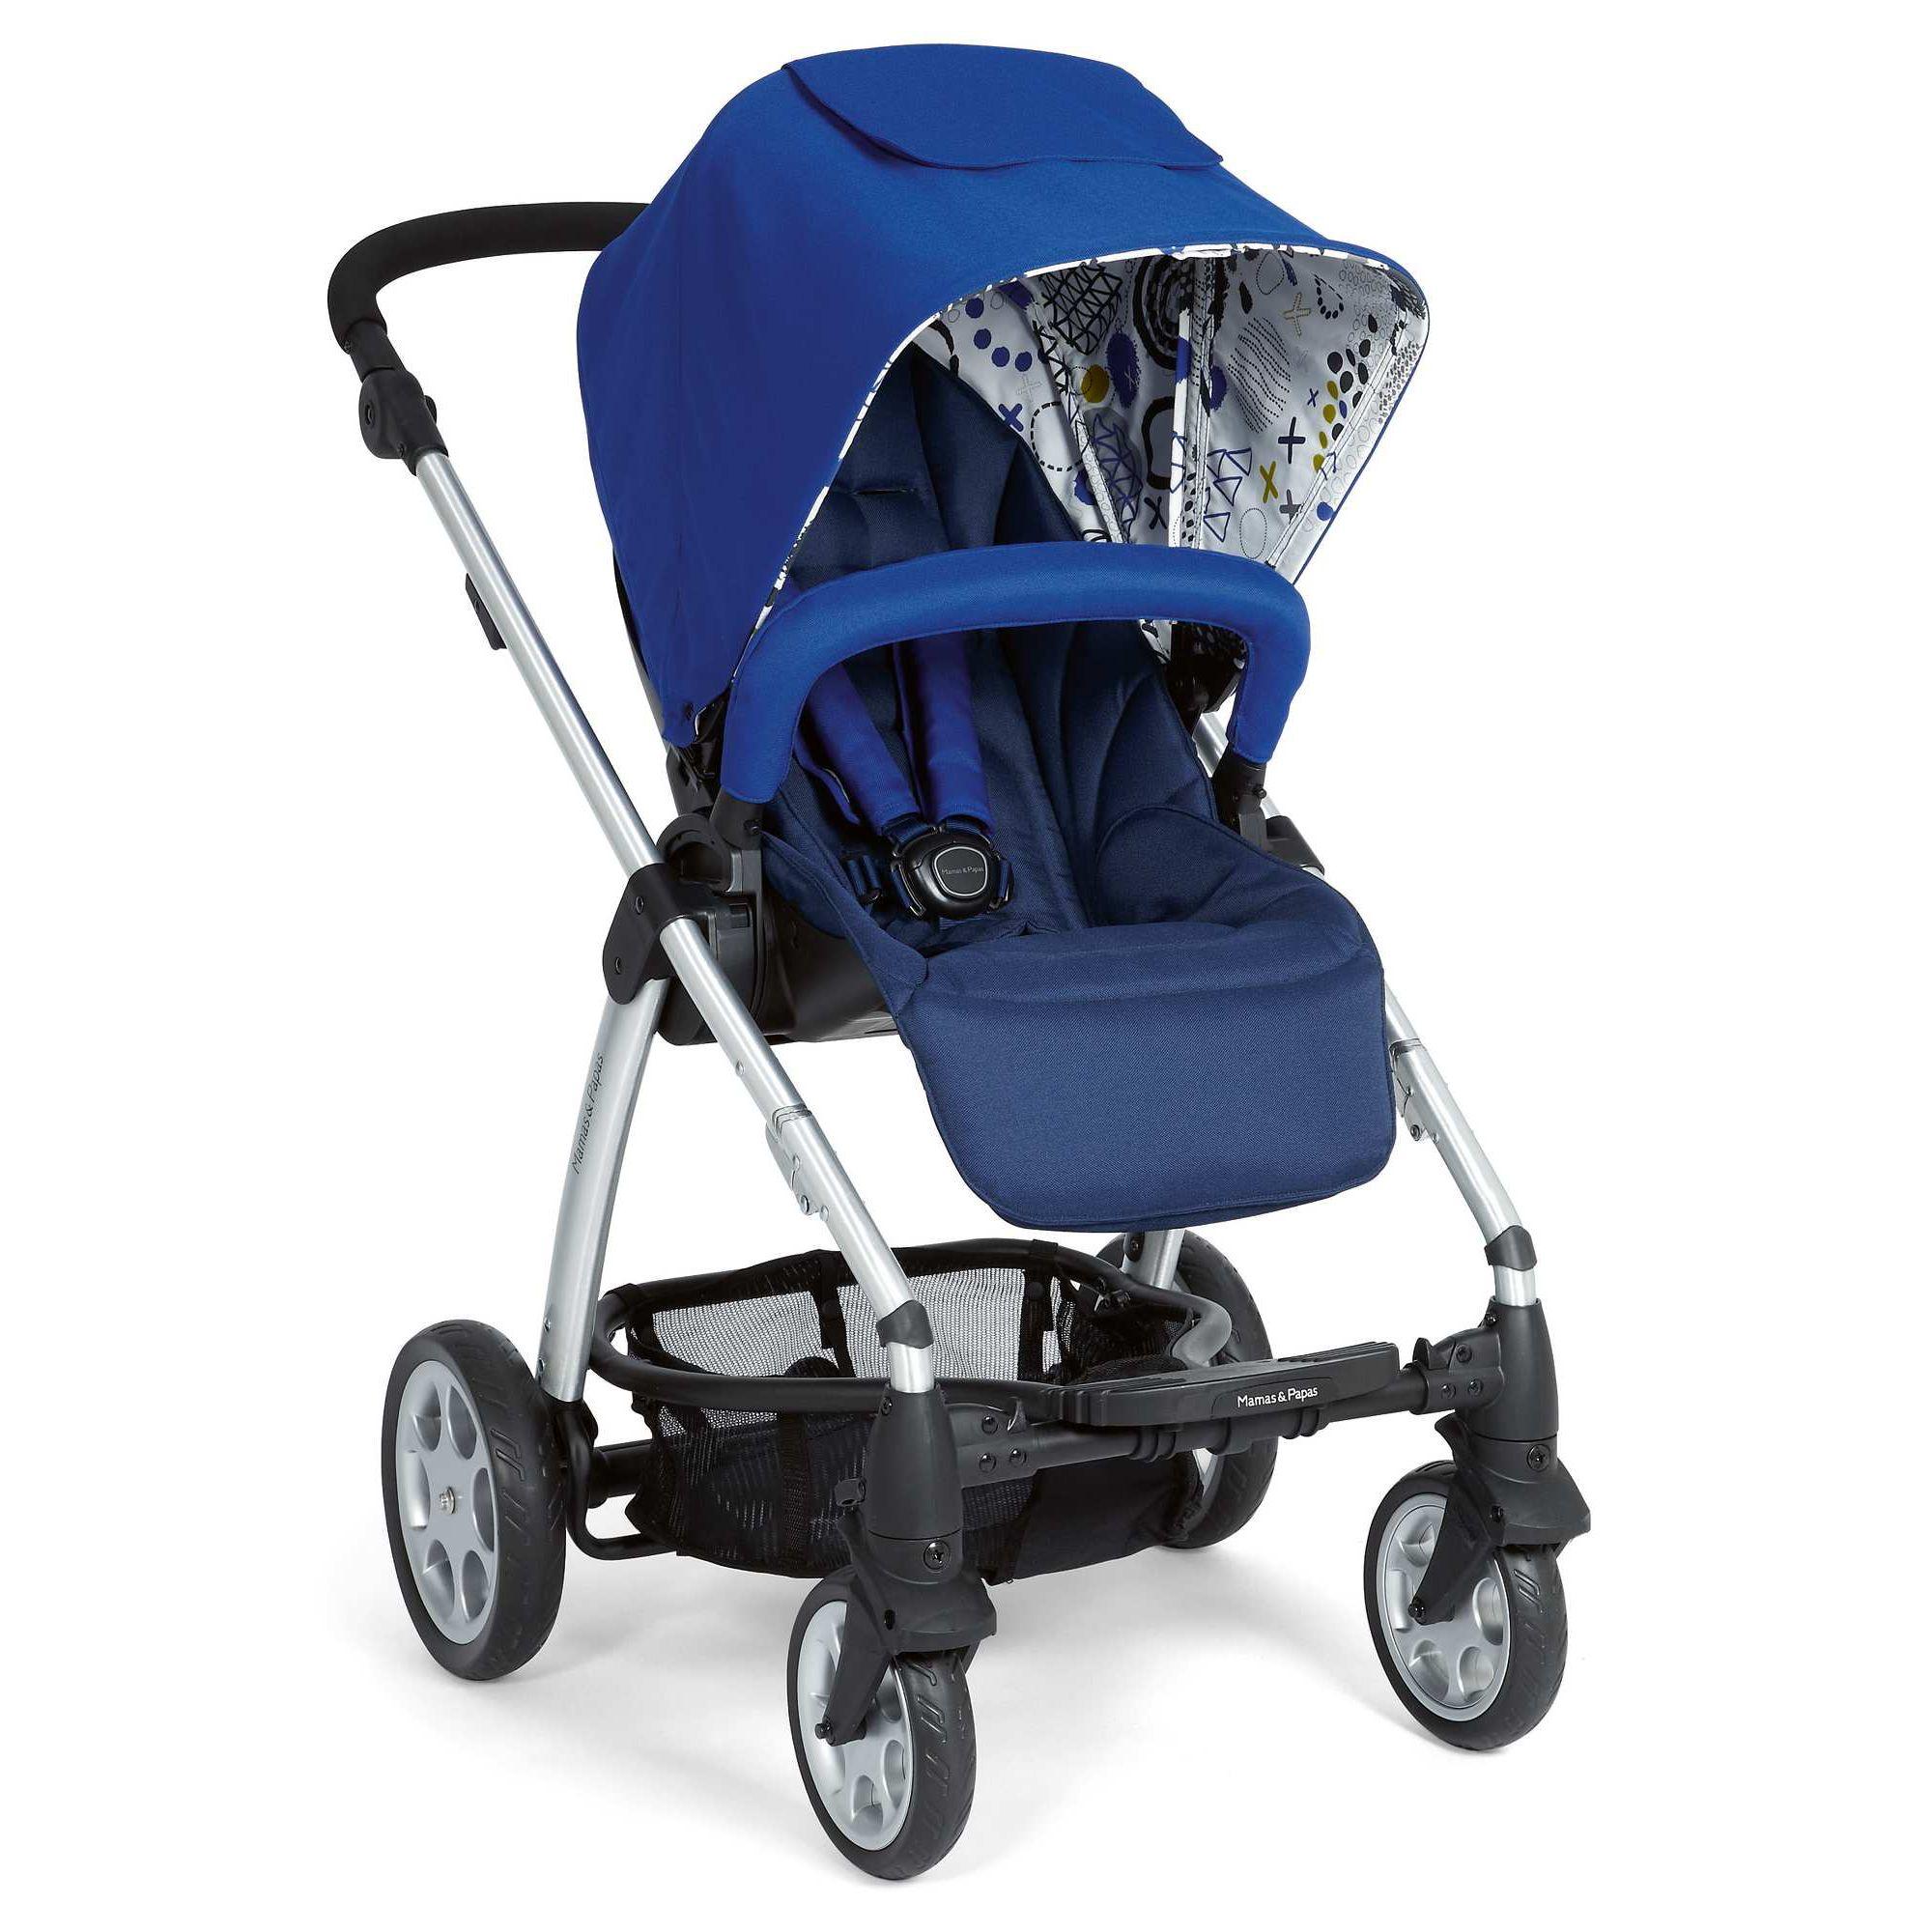 Mamas & Papas - Sola Pushchair - Blue at Tesco Direct